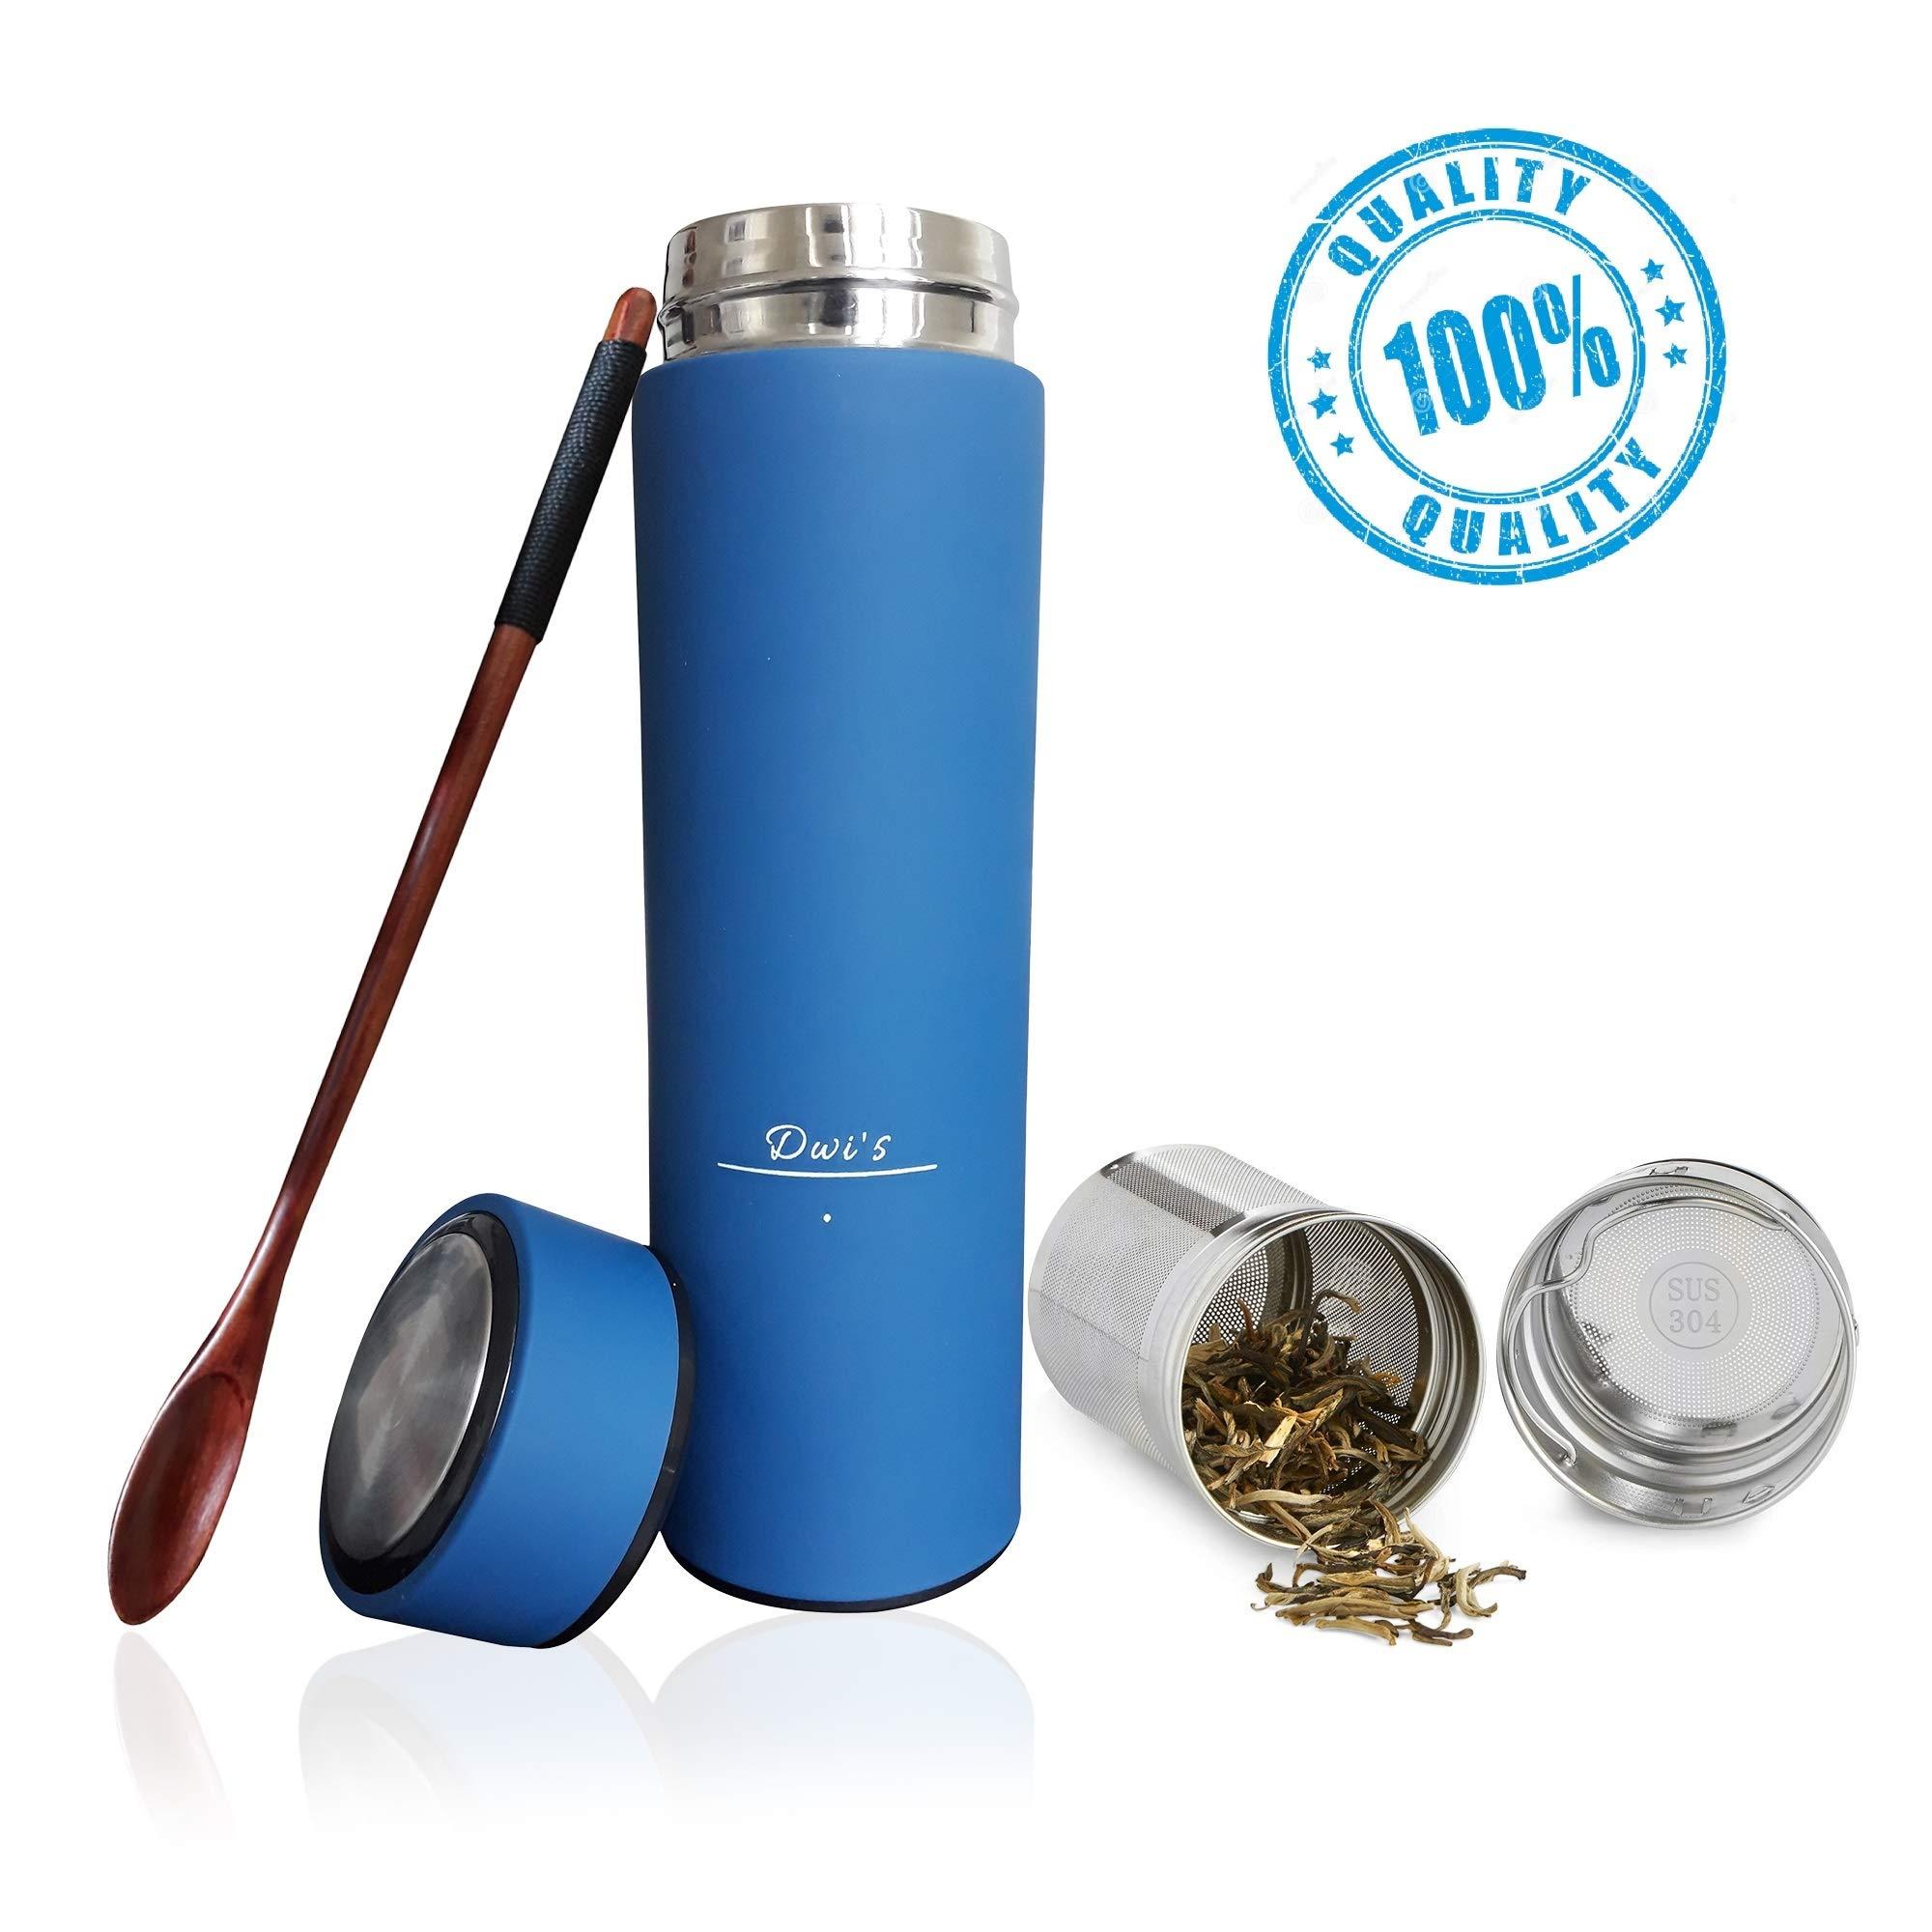 Botella de agua térmica infusor 450 ml + filtro para té infusiones + inserto da fruta